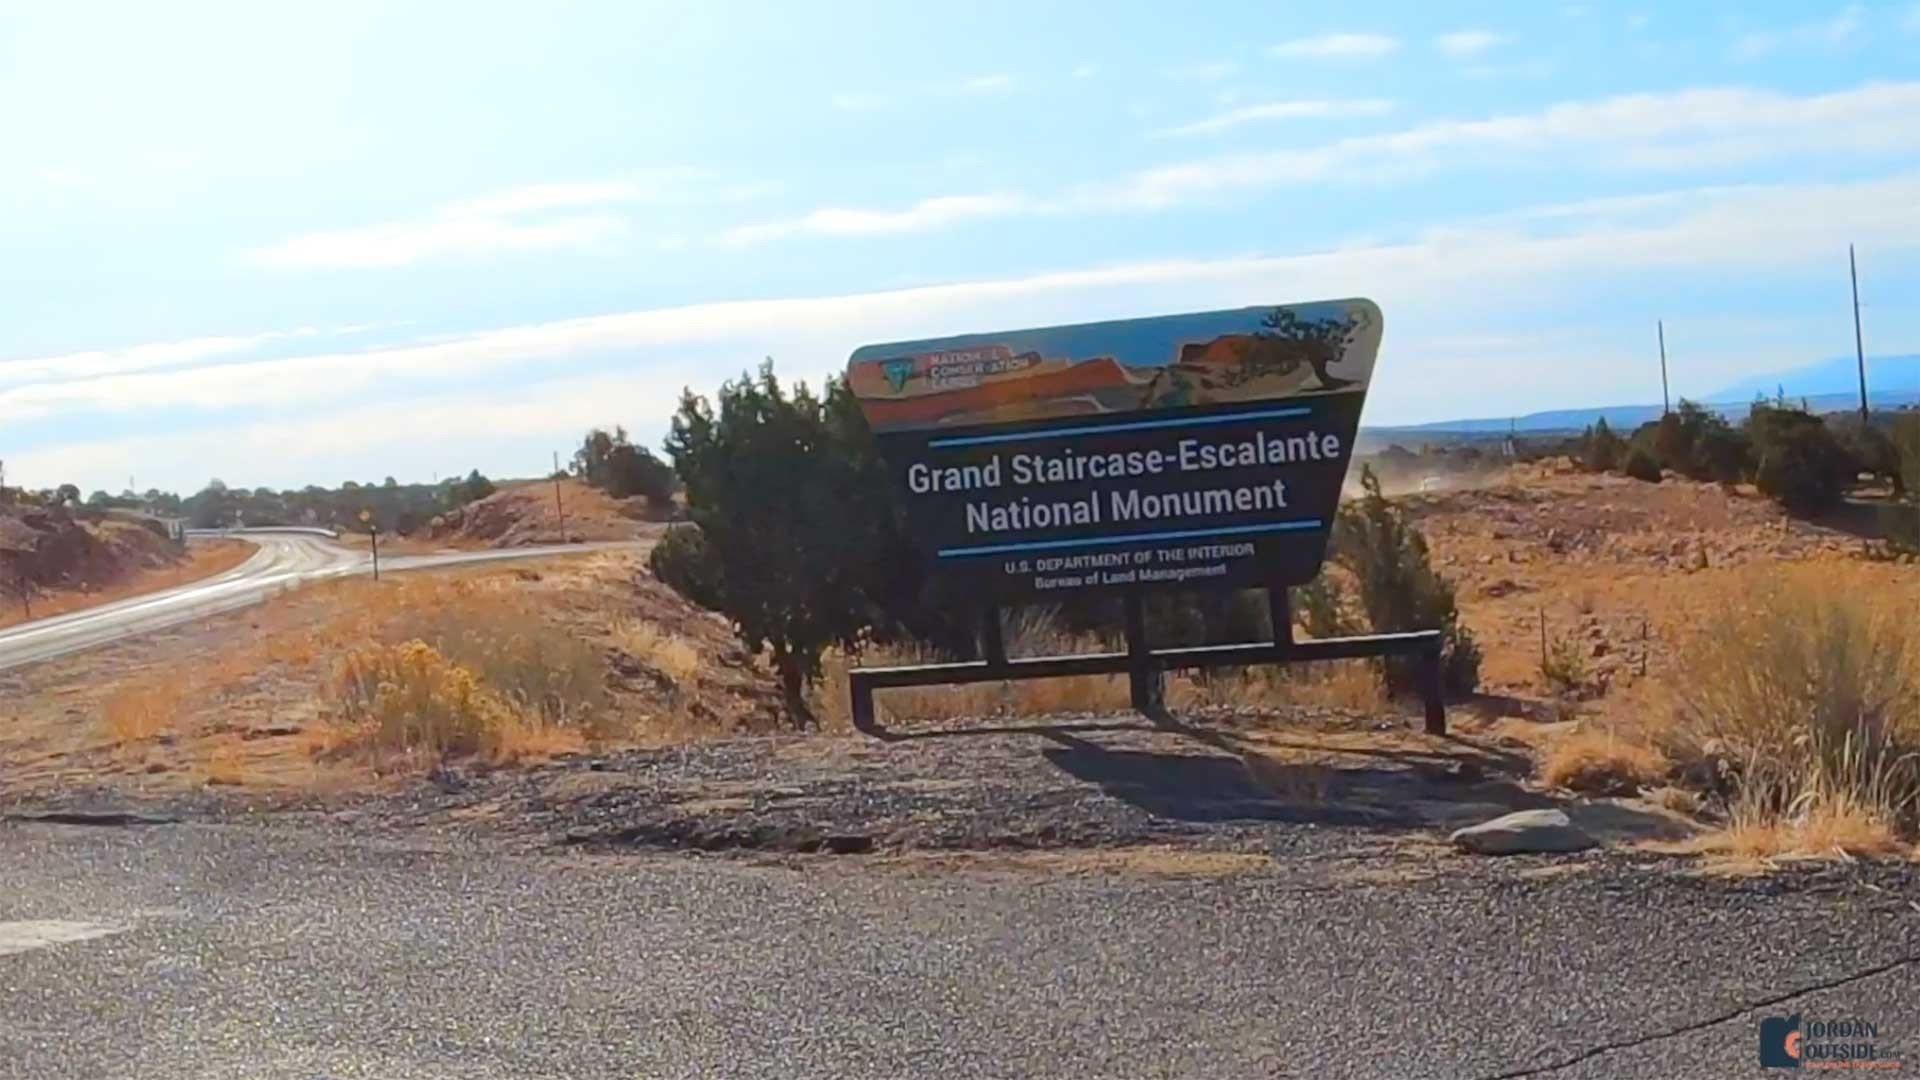 Grand Staircase-Escalante National Monument Sign, Utah